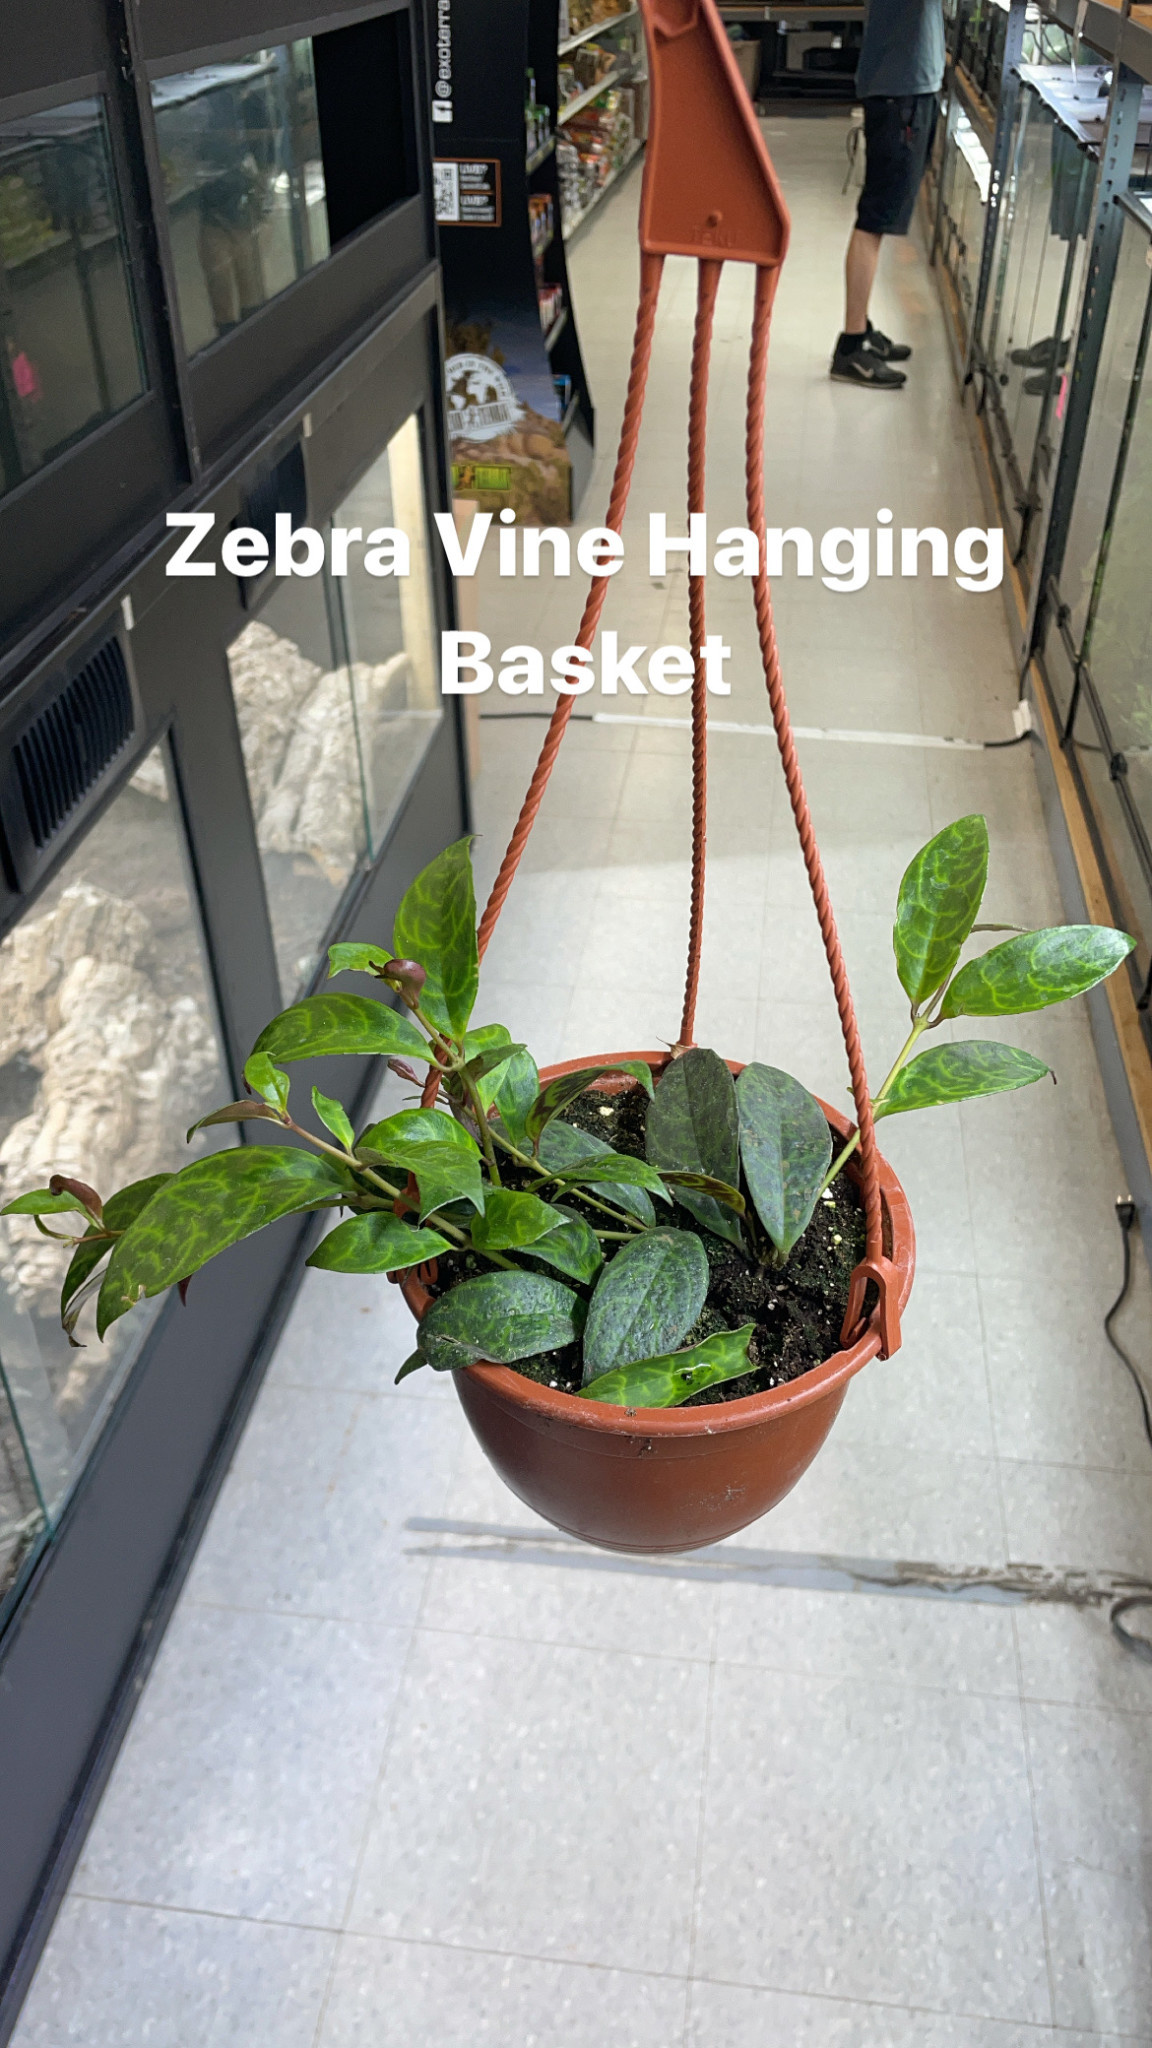 "6"" Zebra Vine Hanging Basket"